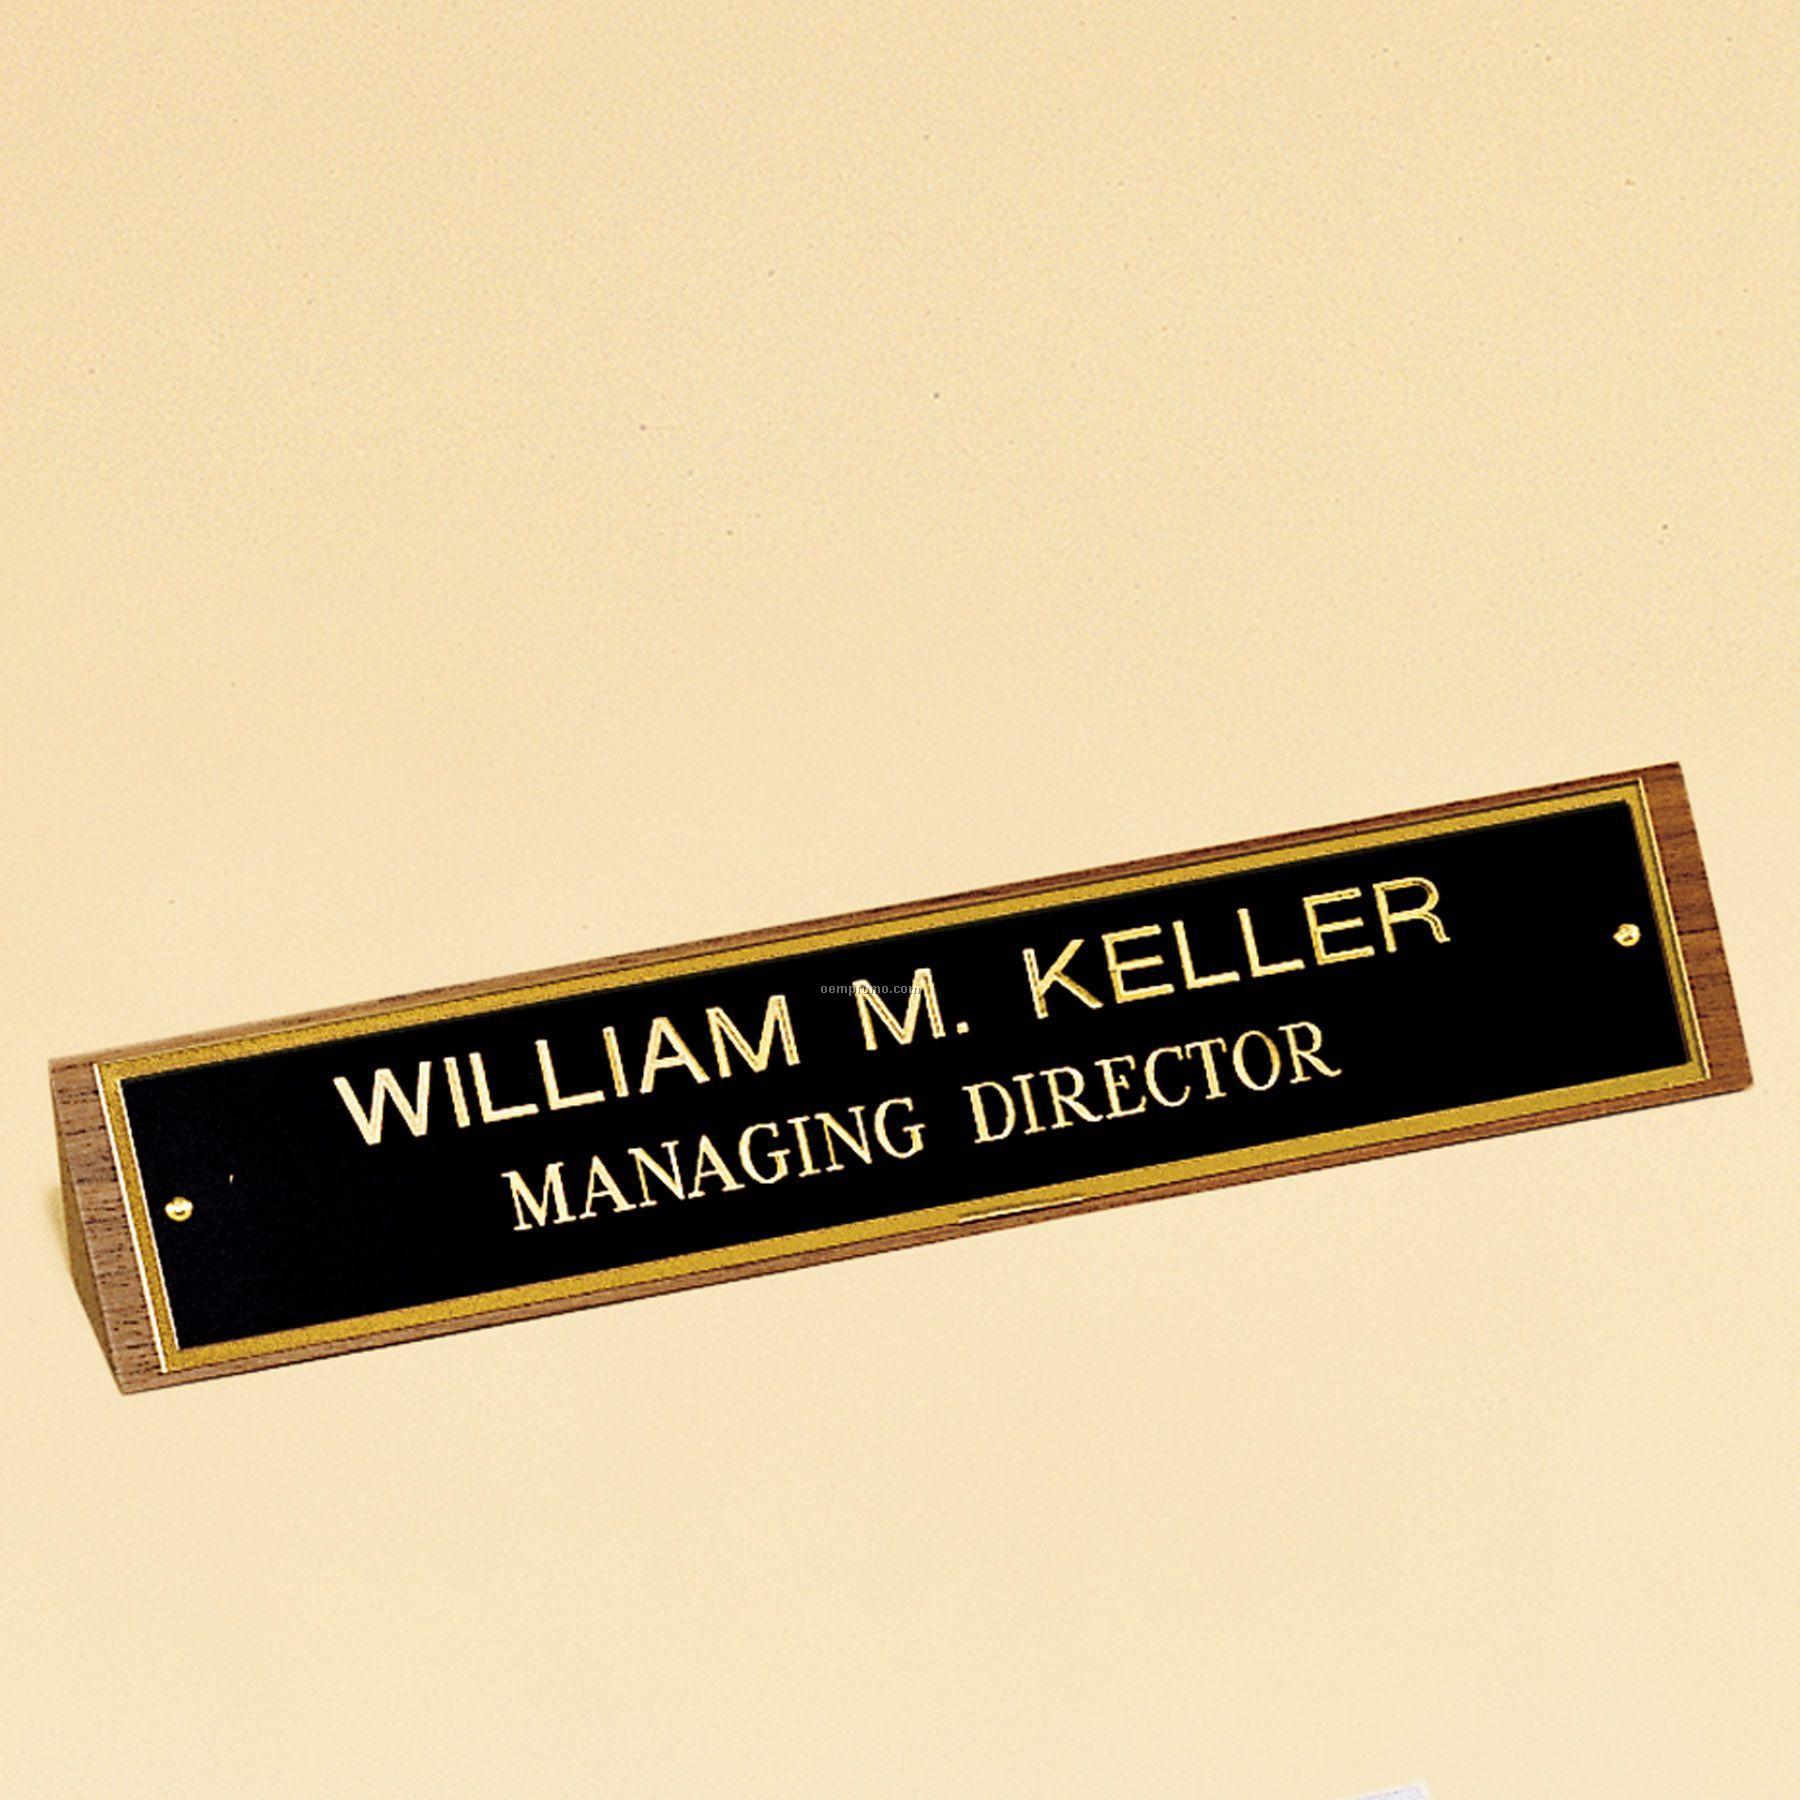 American Walnut Name Plate China Wholesale American Walnut